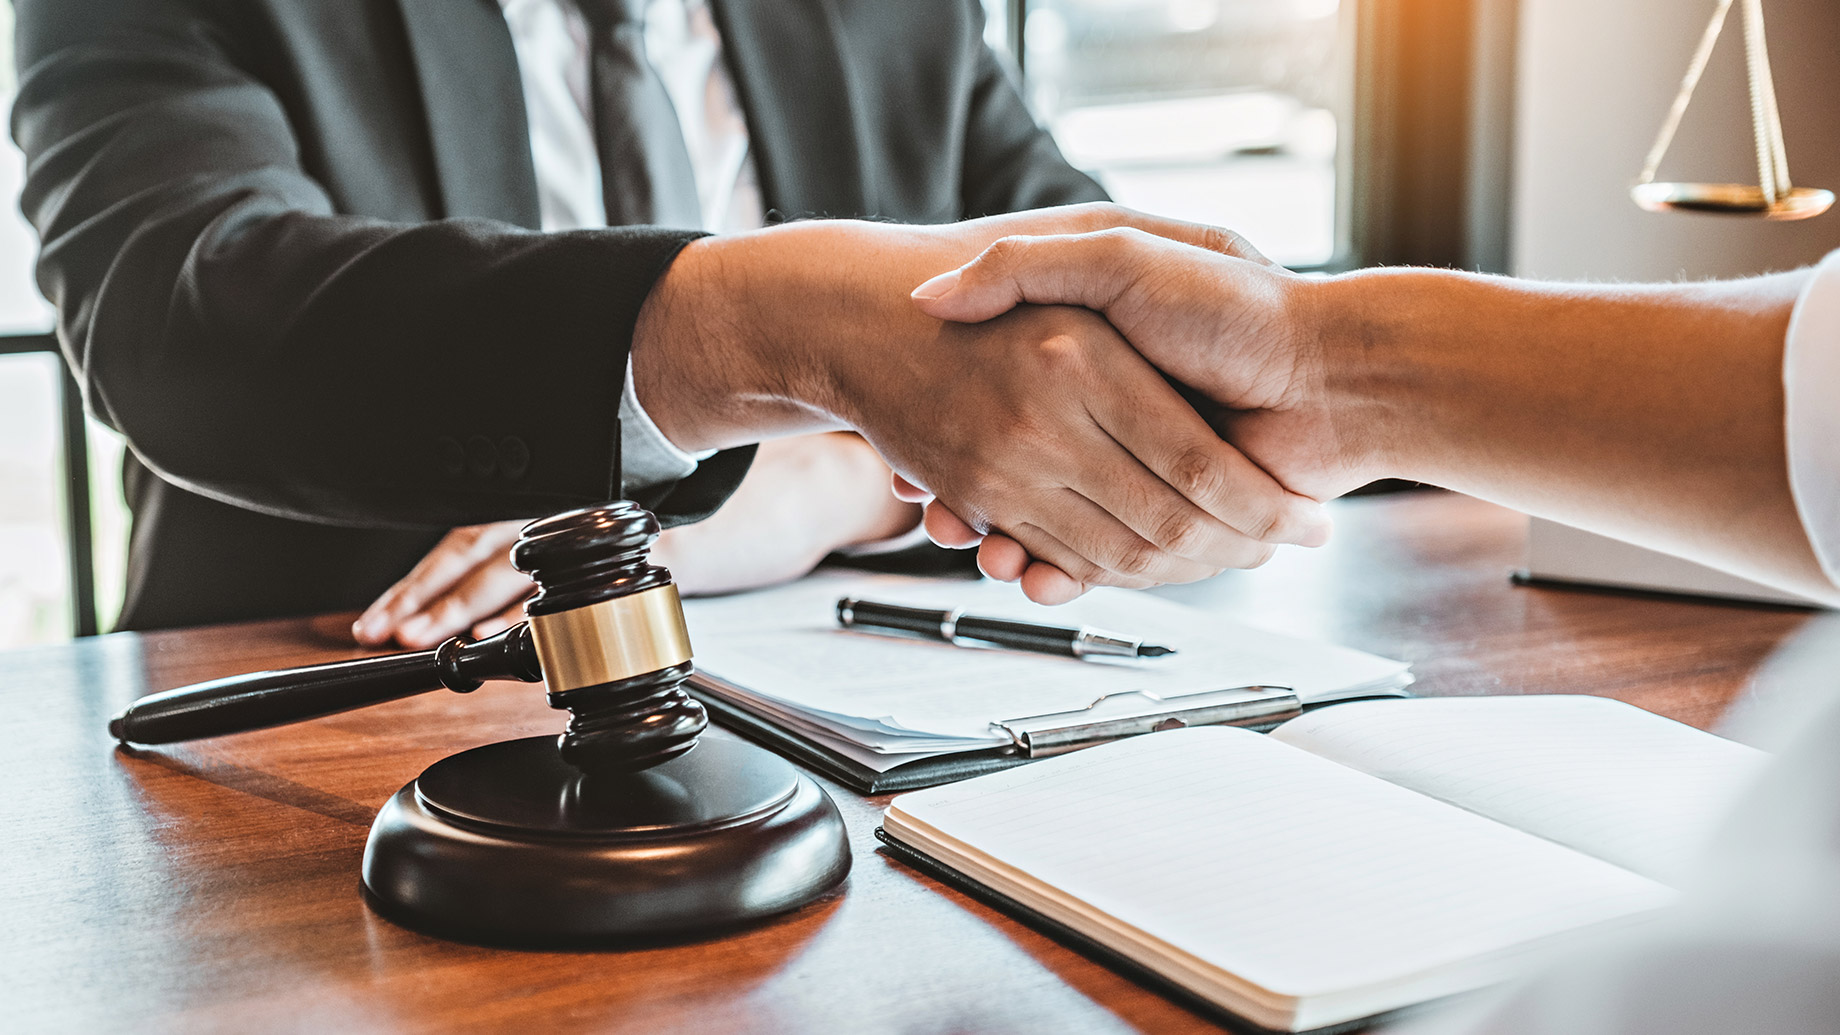 real estate laawyer handshake deal